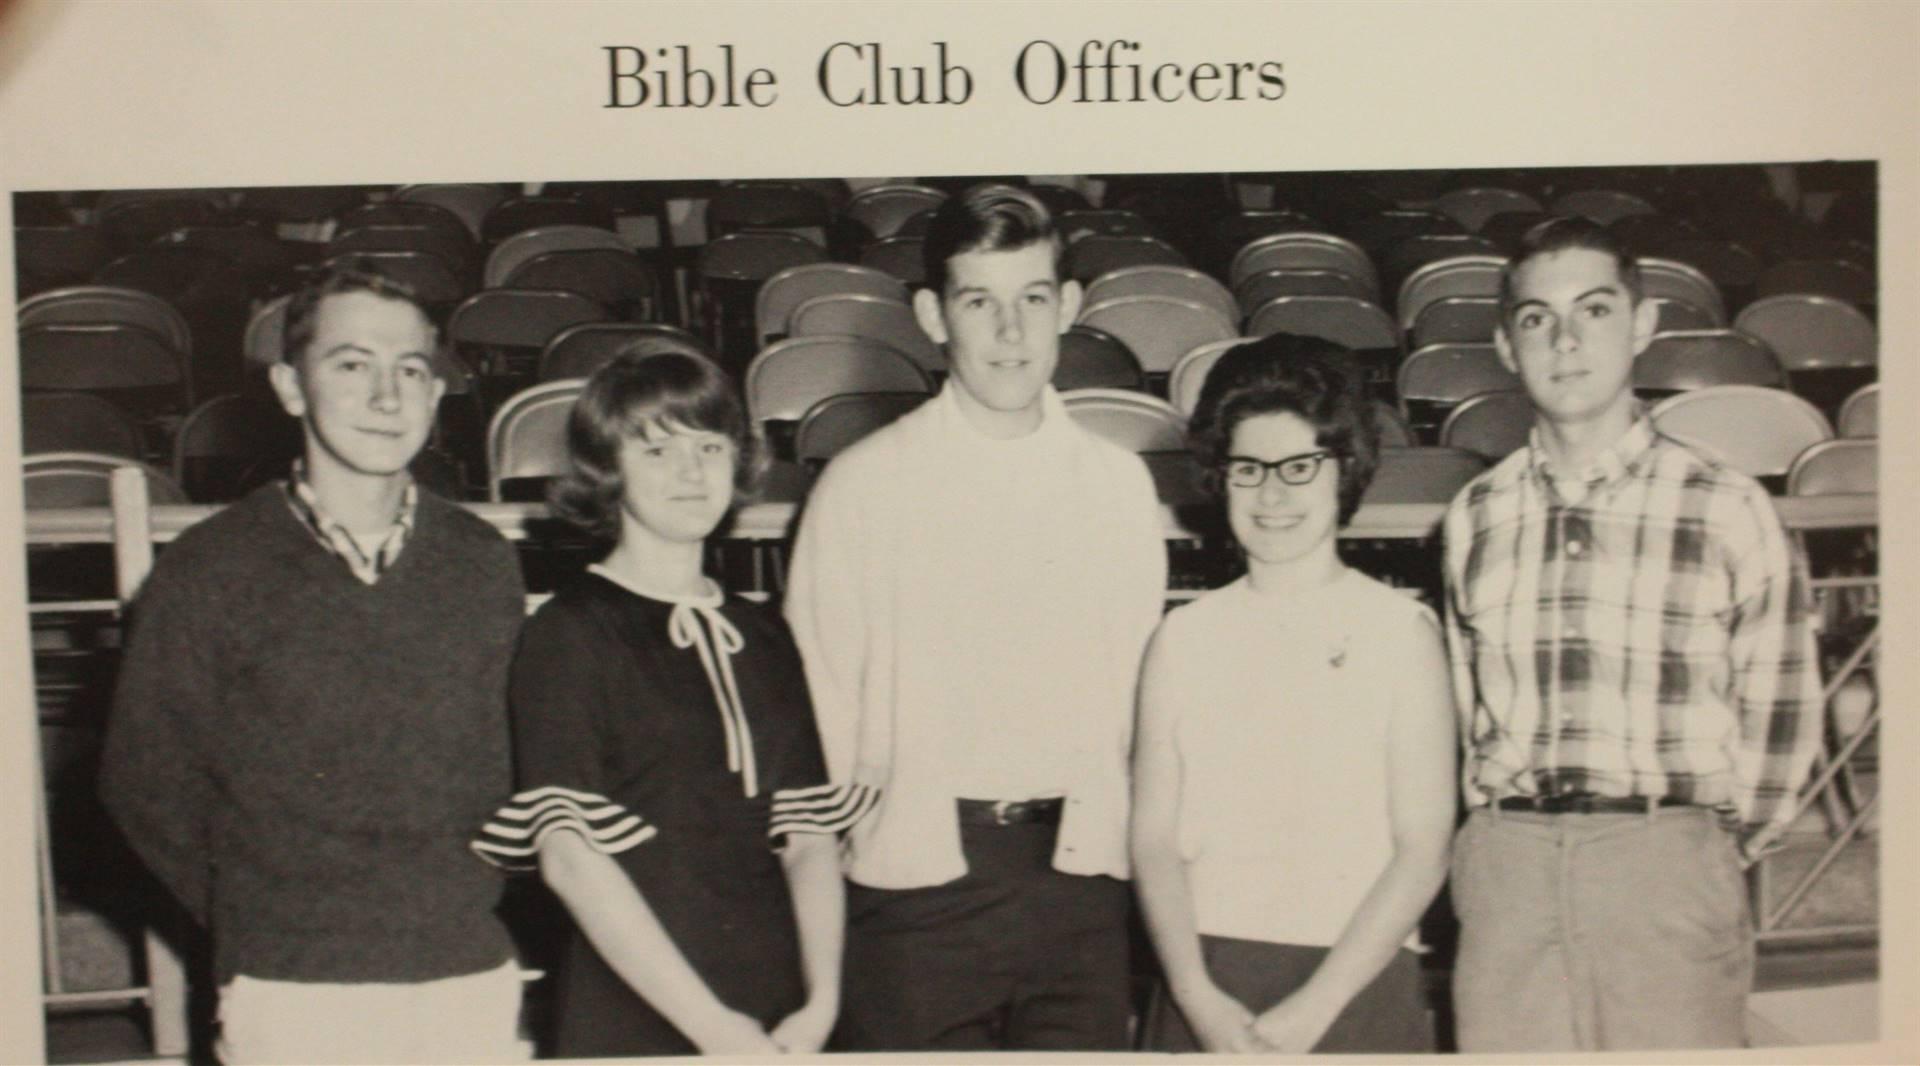 1967 Bible club